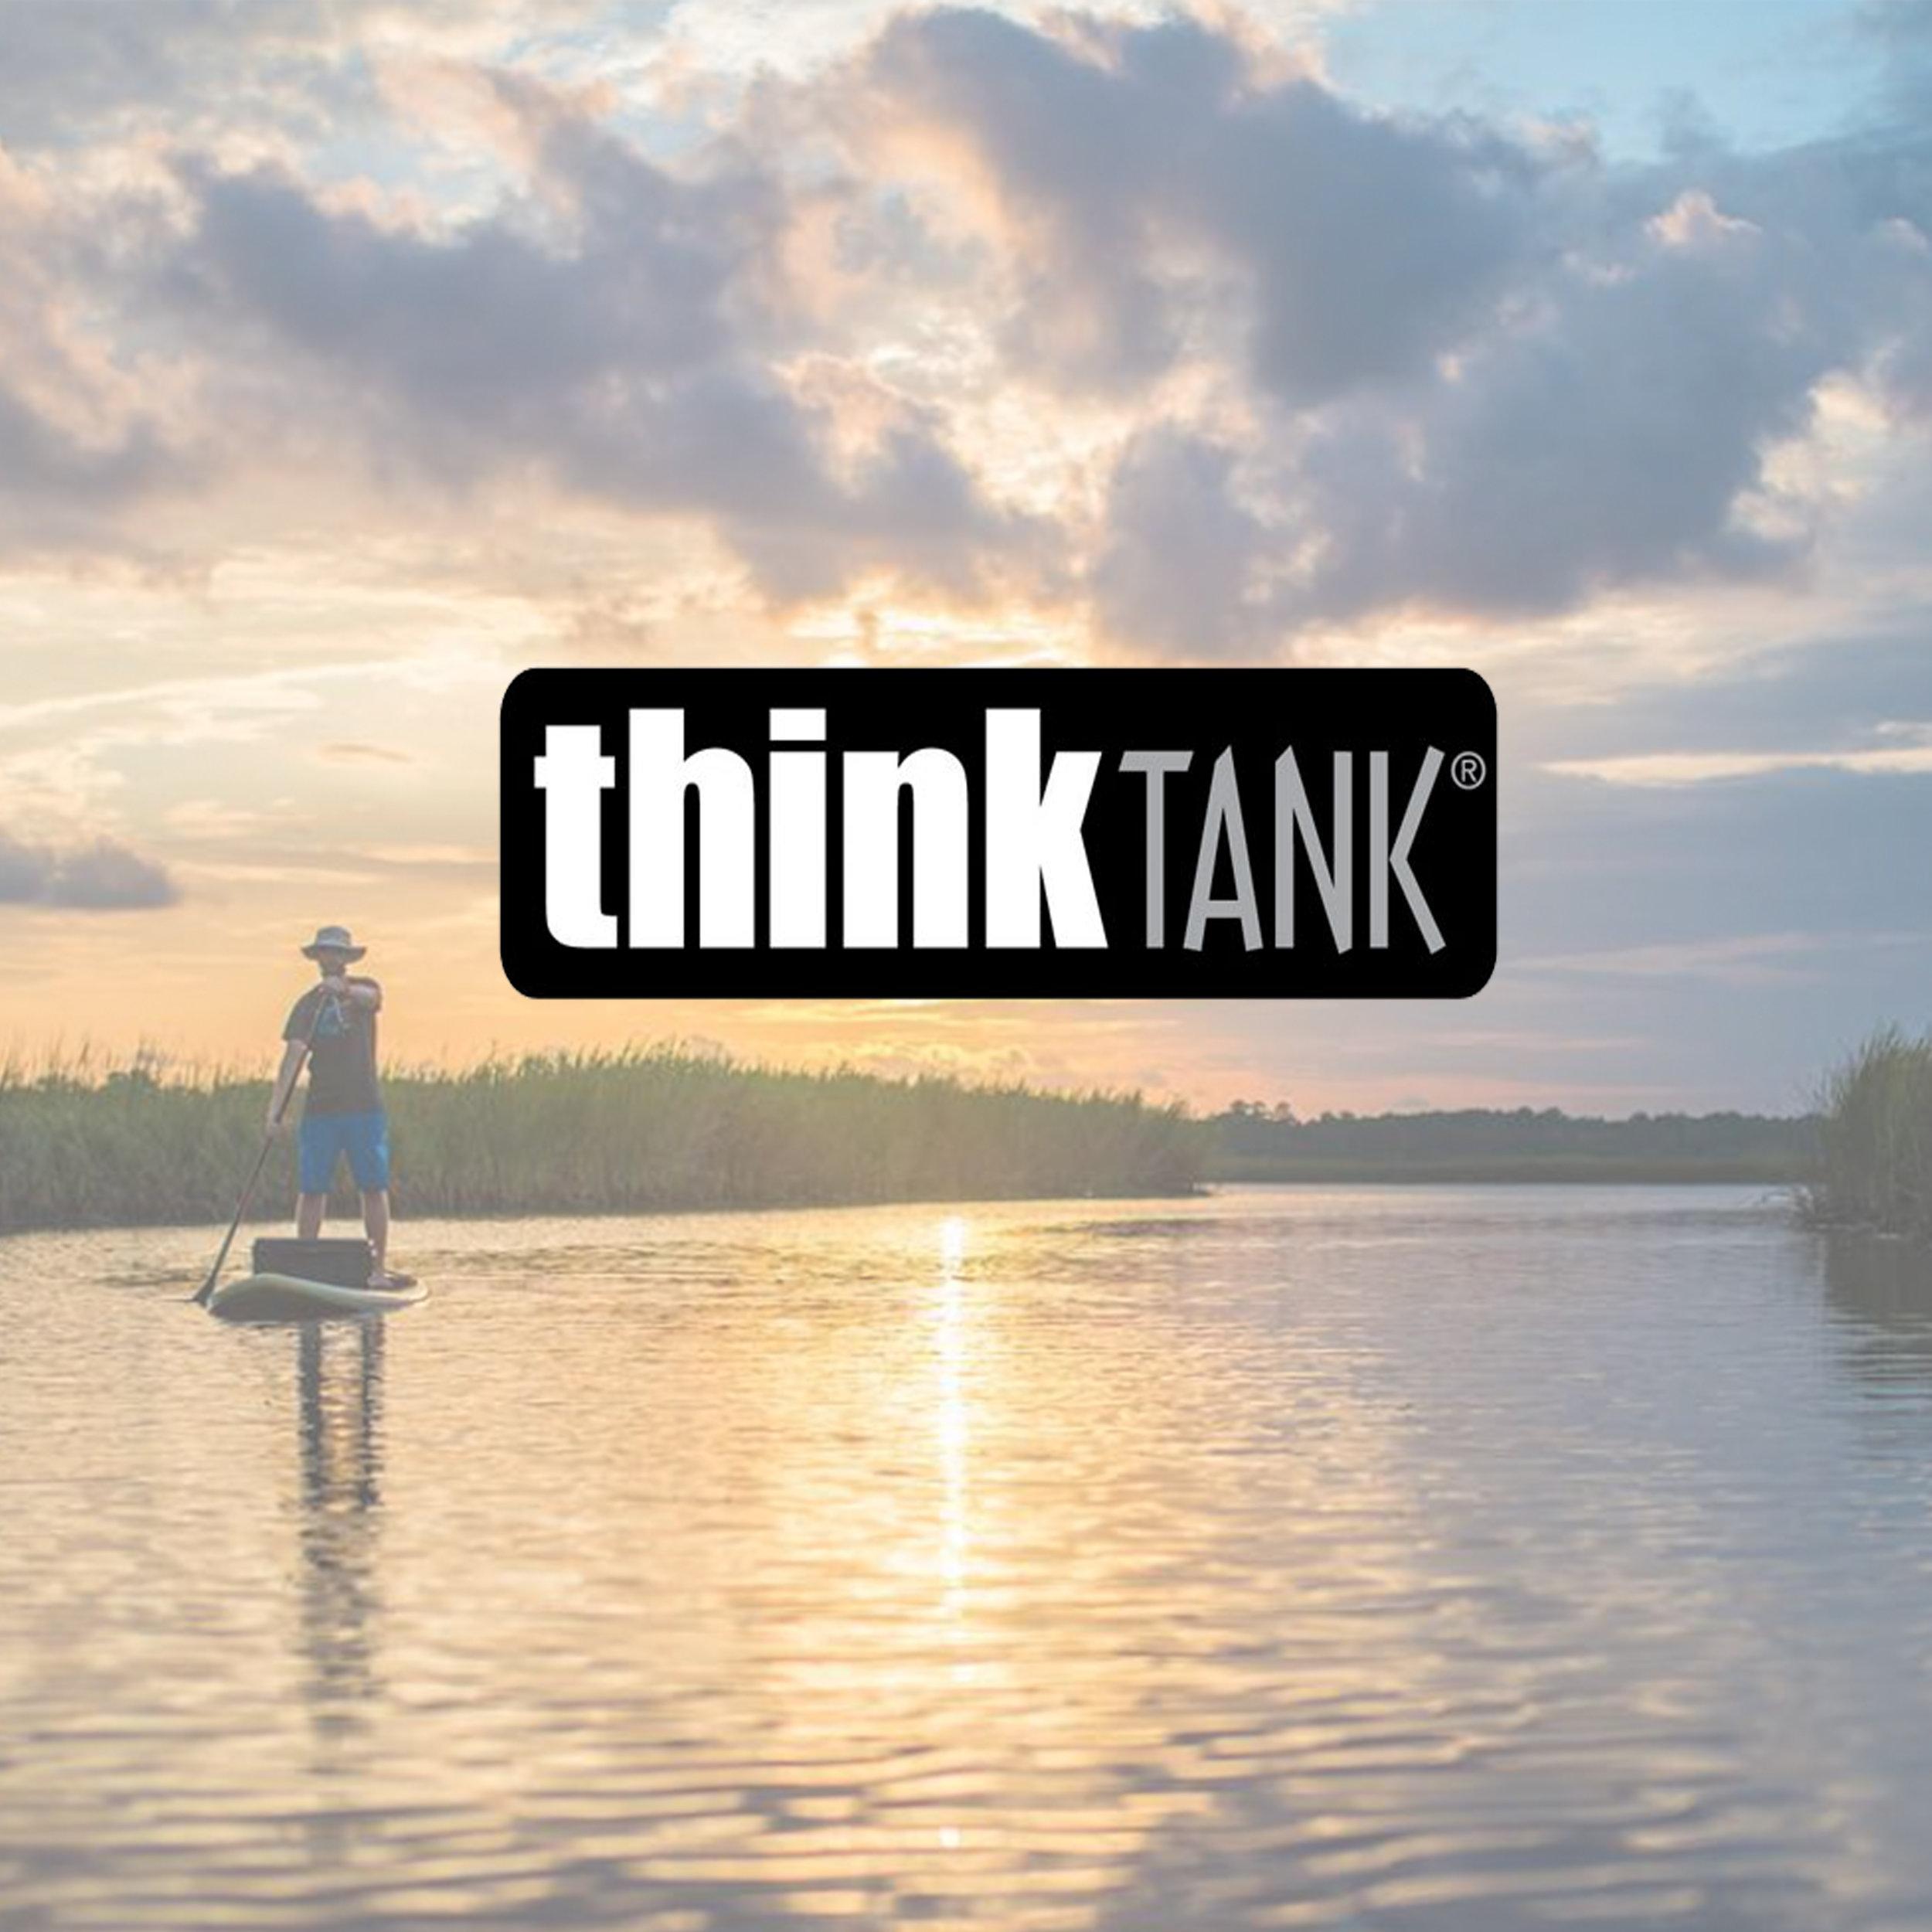 think tank.jpg